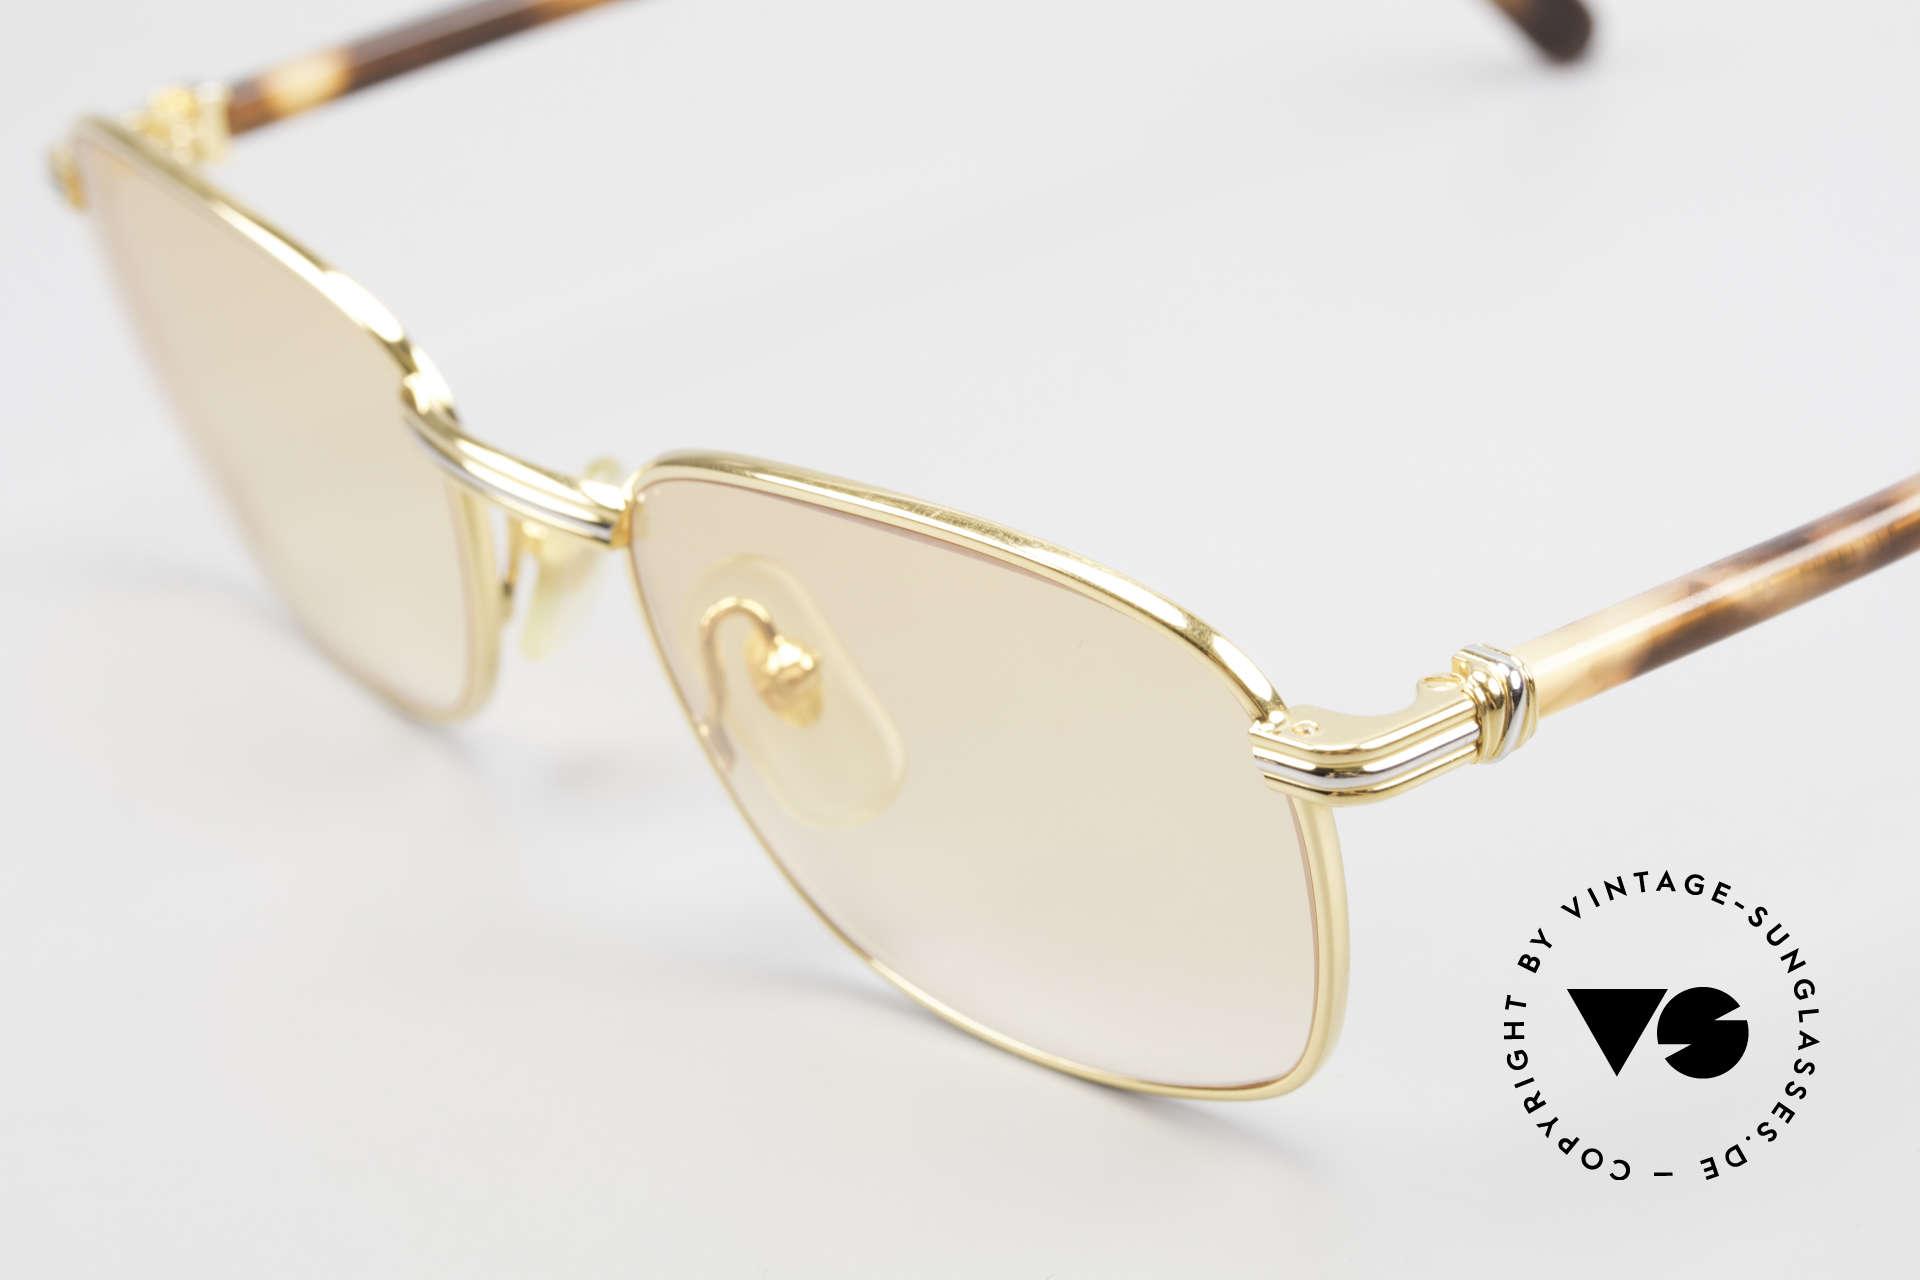 Cartier Aube Orange Gradient Luxury Shades, new orange-gradient lenses (also wearable at twilight), Made for Men